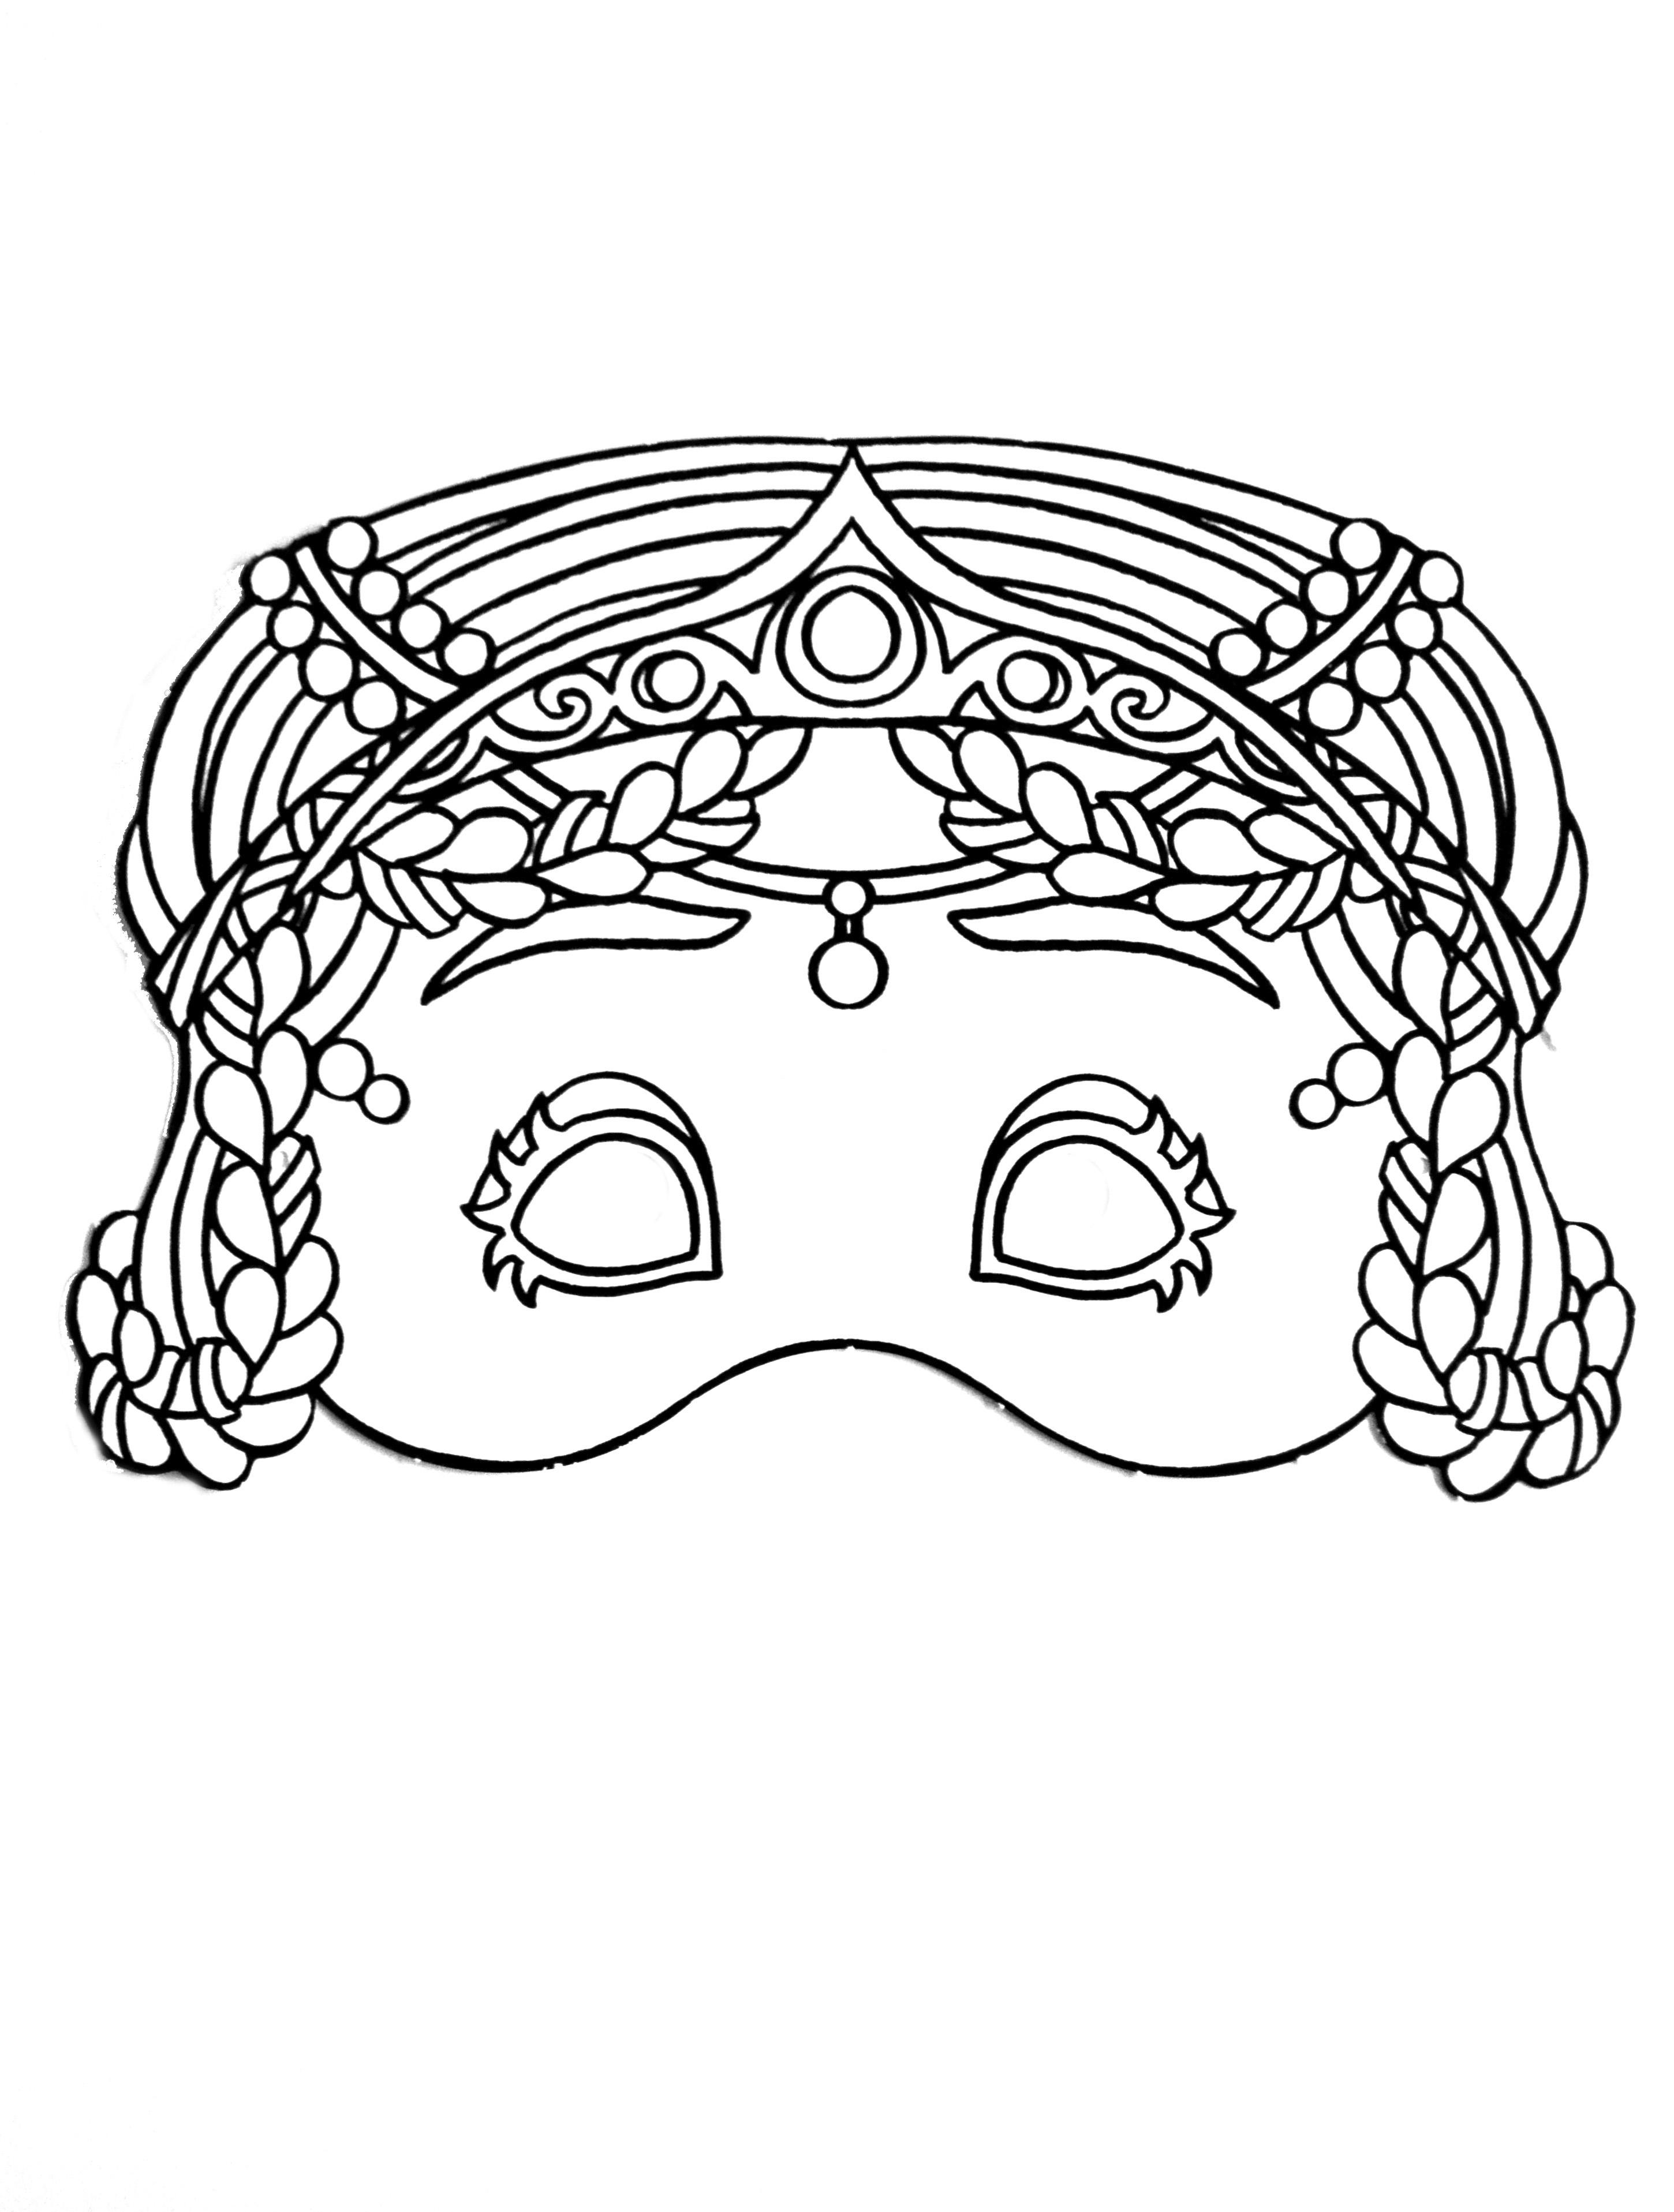 Beau dessin a imprimer carnaval de rio - Coloriage masque ...